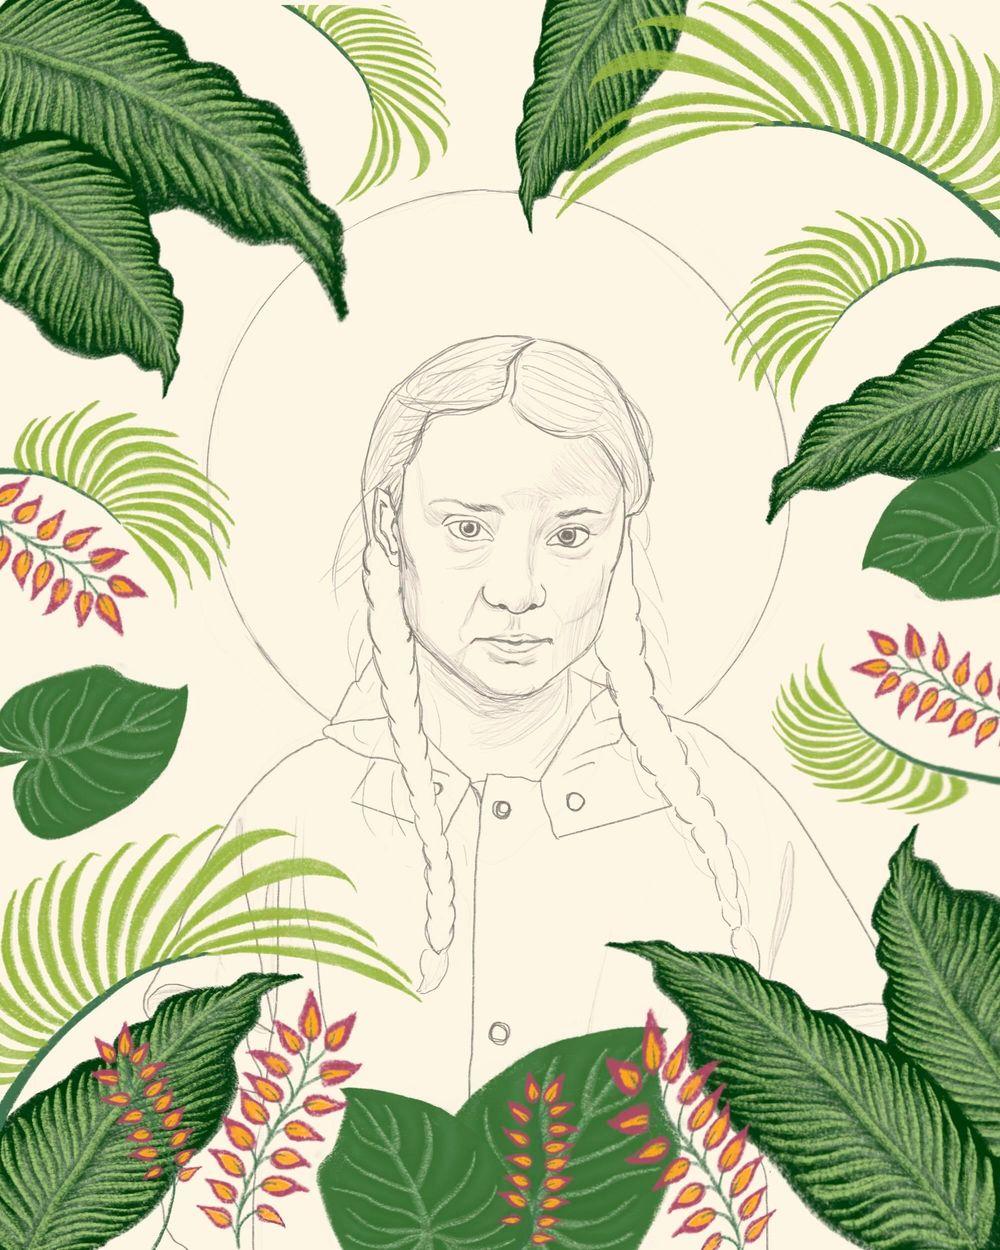 Greta Thunberg illustration - image 2 - student project